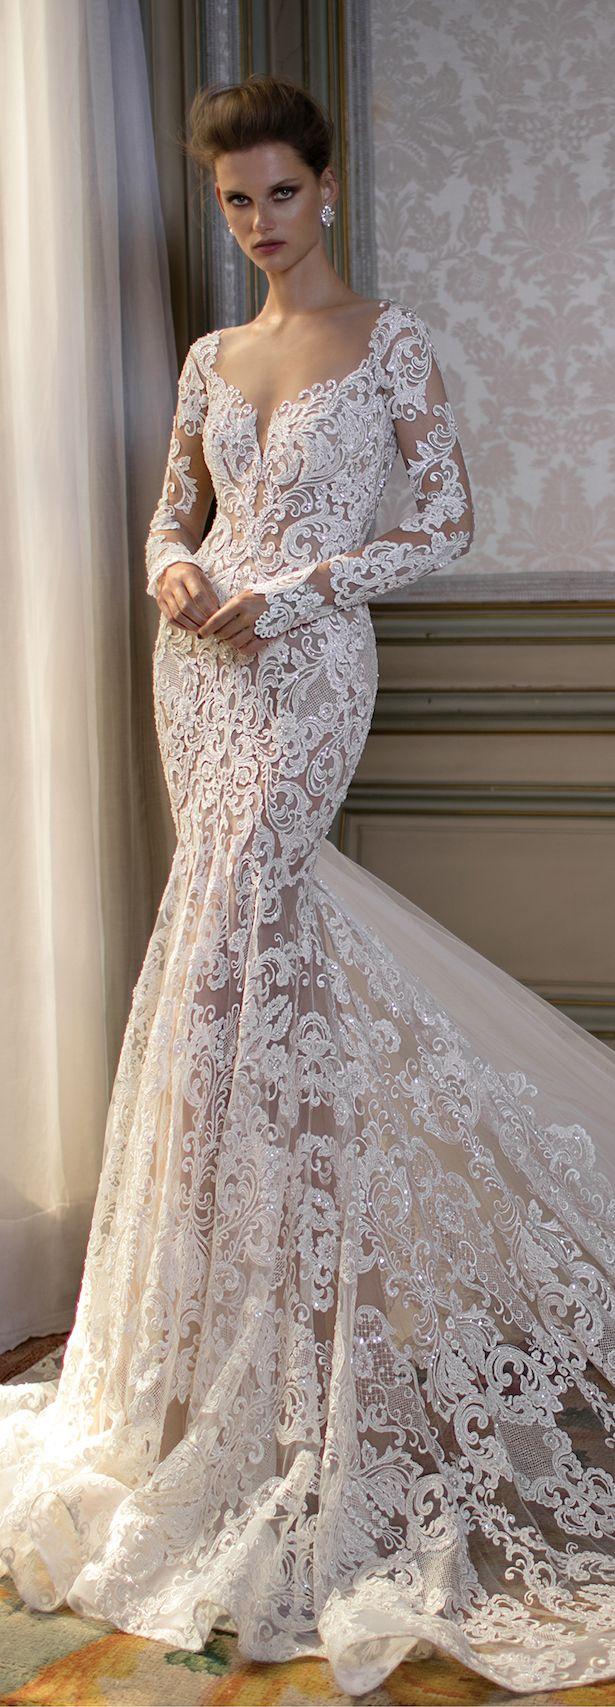 72 best Brautkleid images on Pinterest   Brautkleid, Brautkleider ...